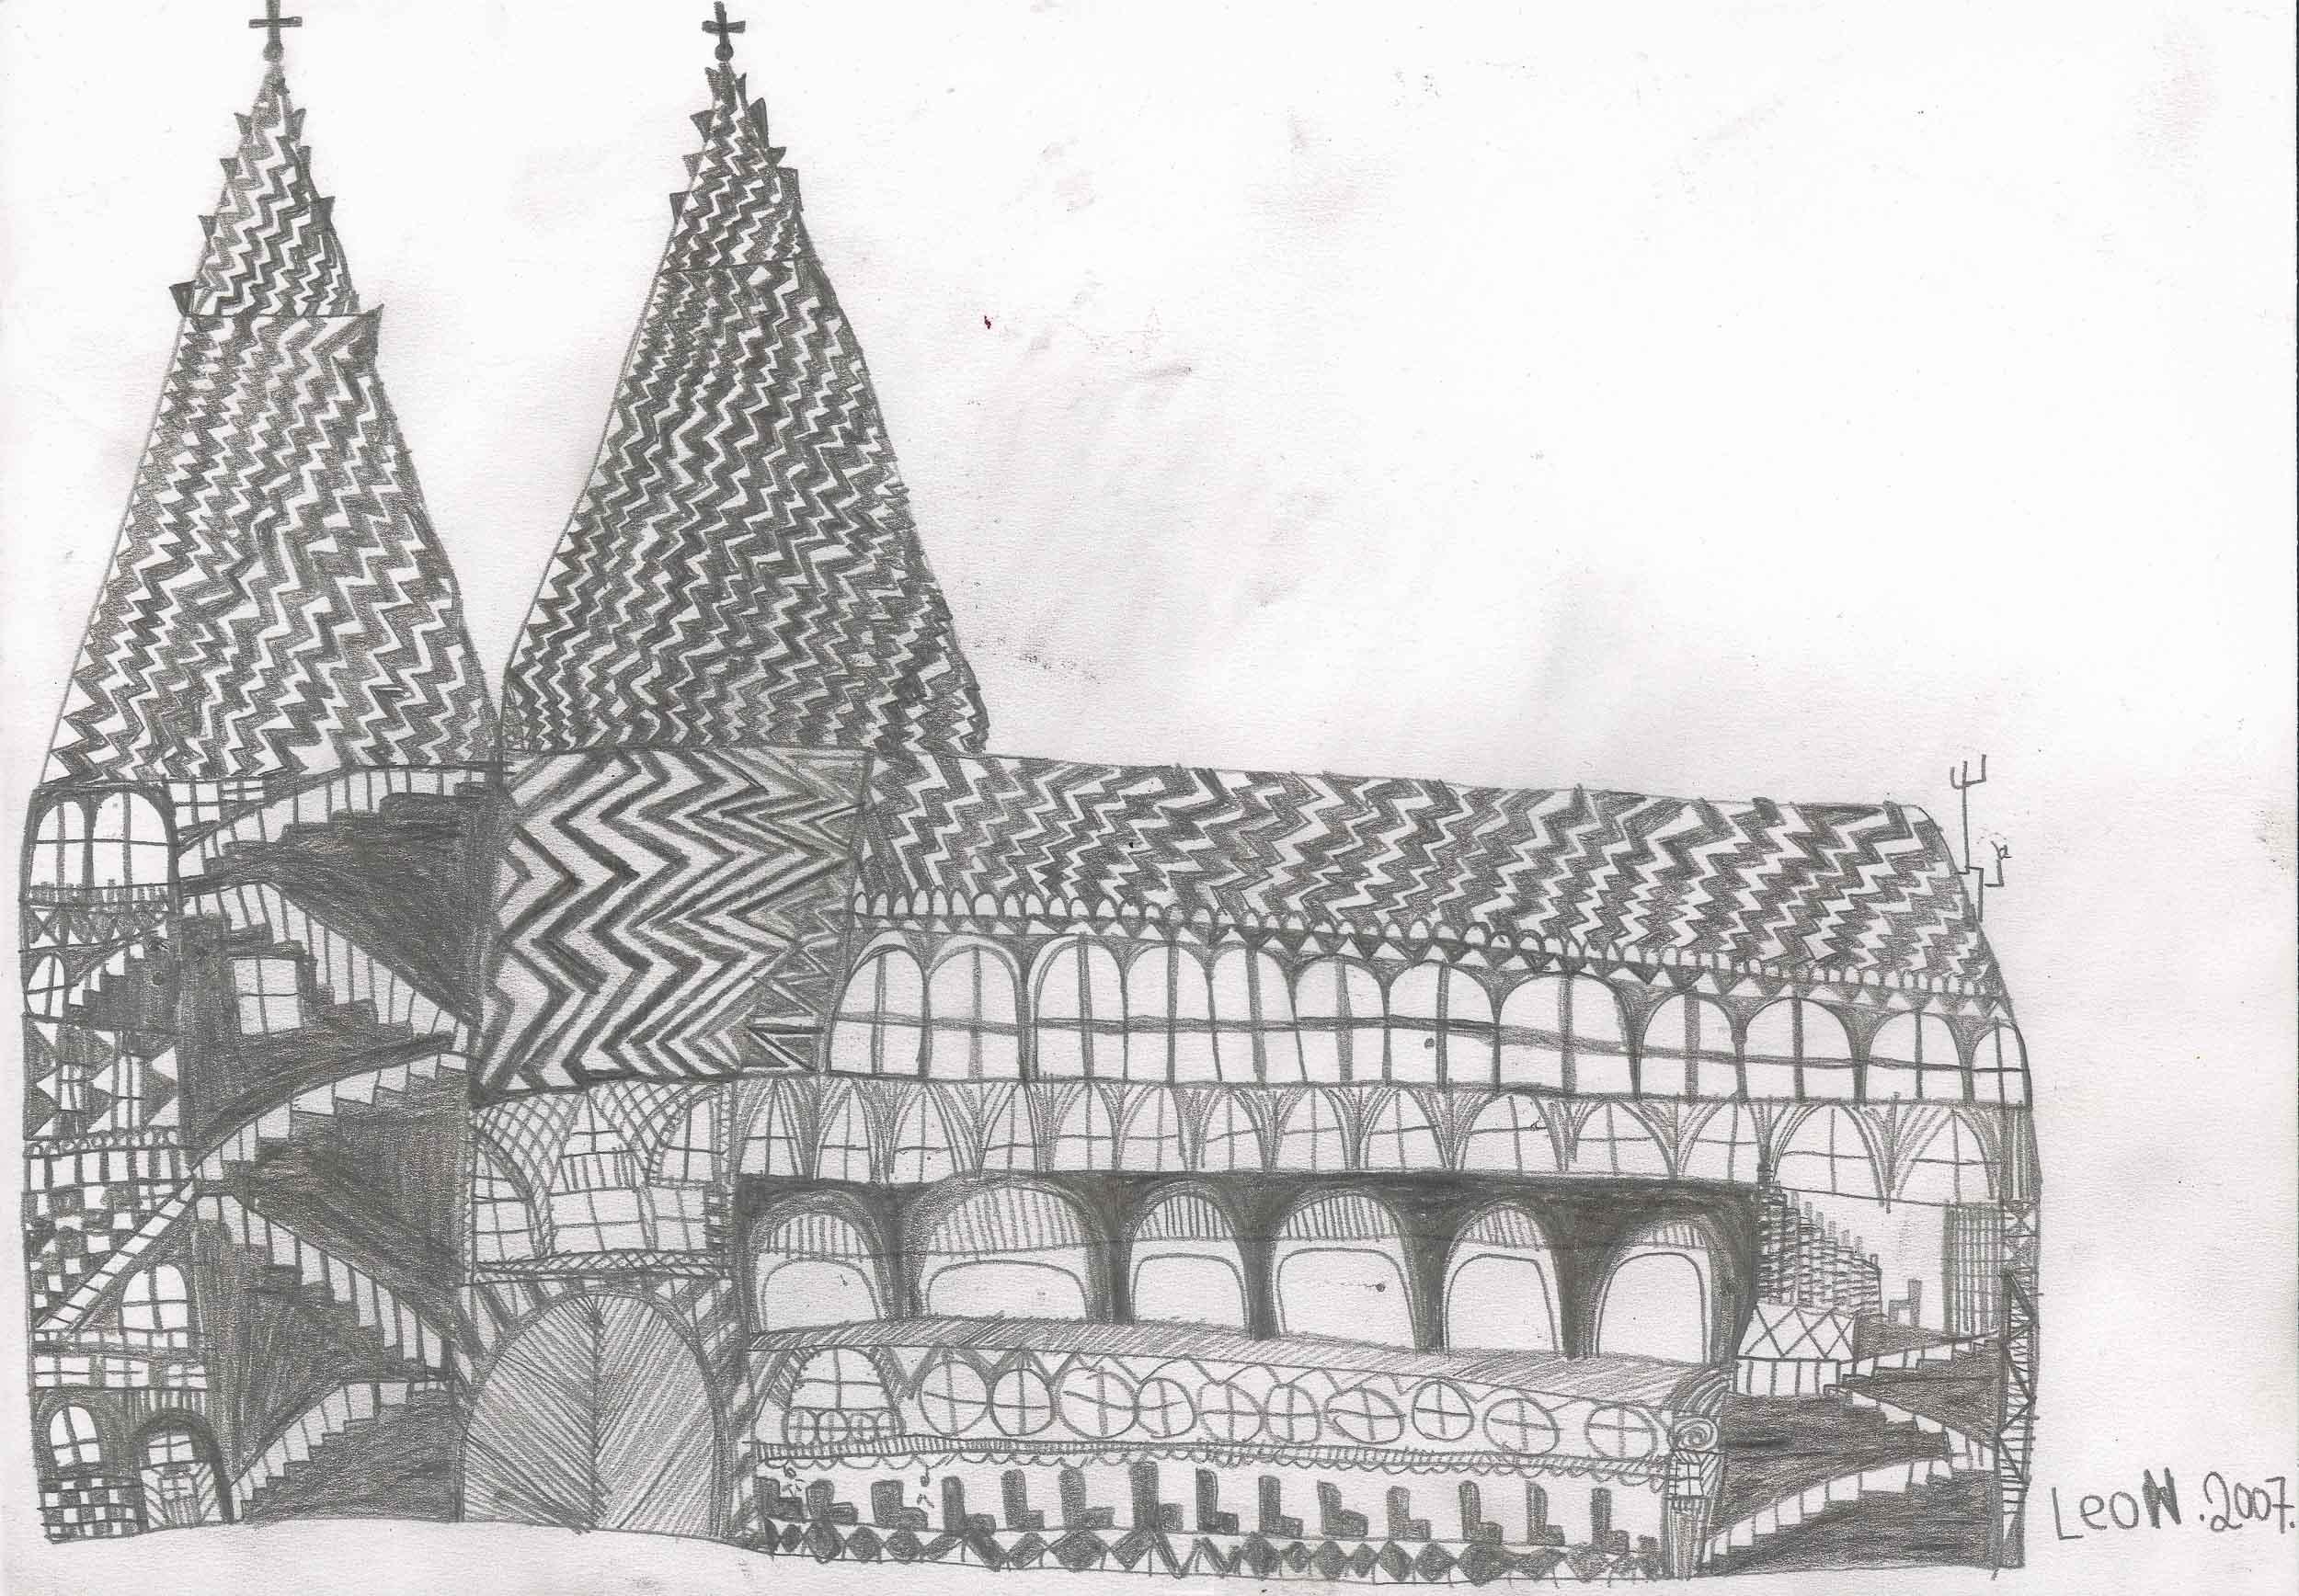 fink leonhard - Die Stephanskirche / St. Stephen's Cathedral